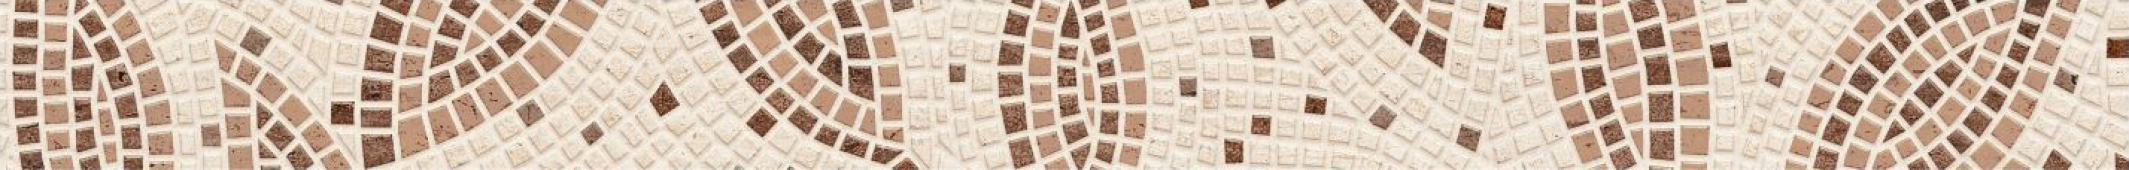 Фриз Travertine Mosaic коричневый 40*3